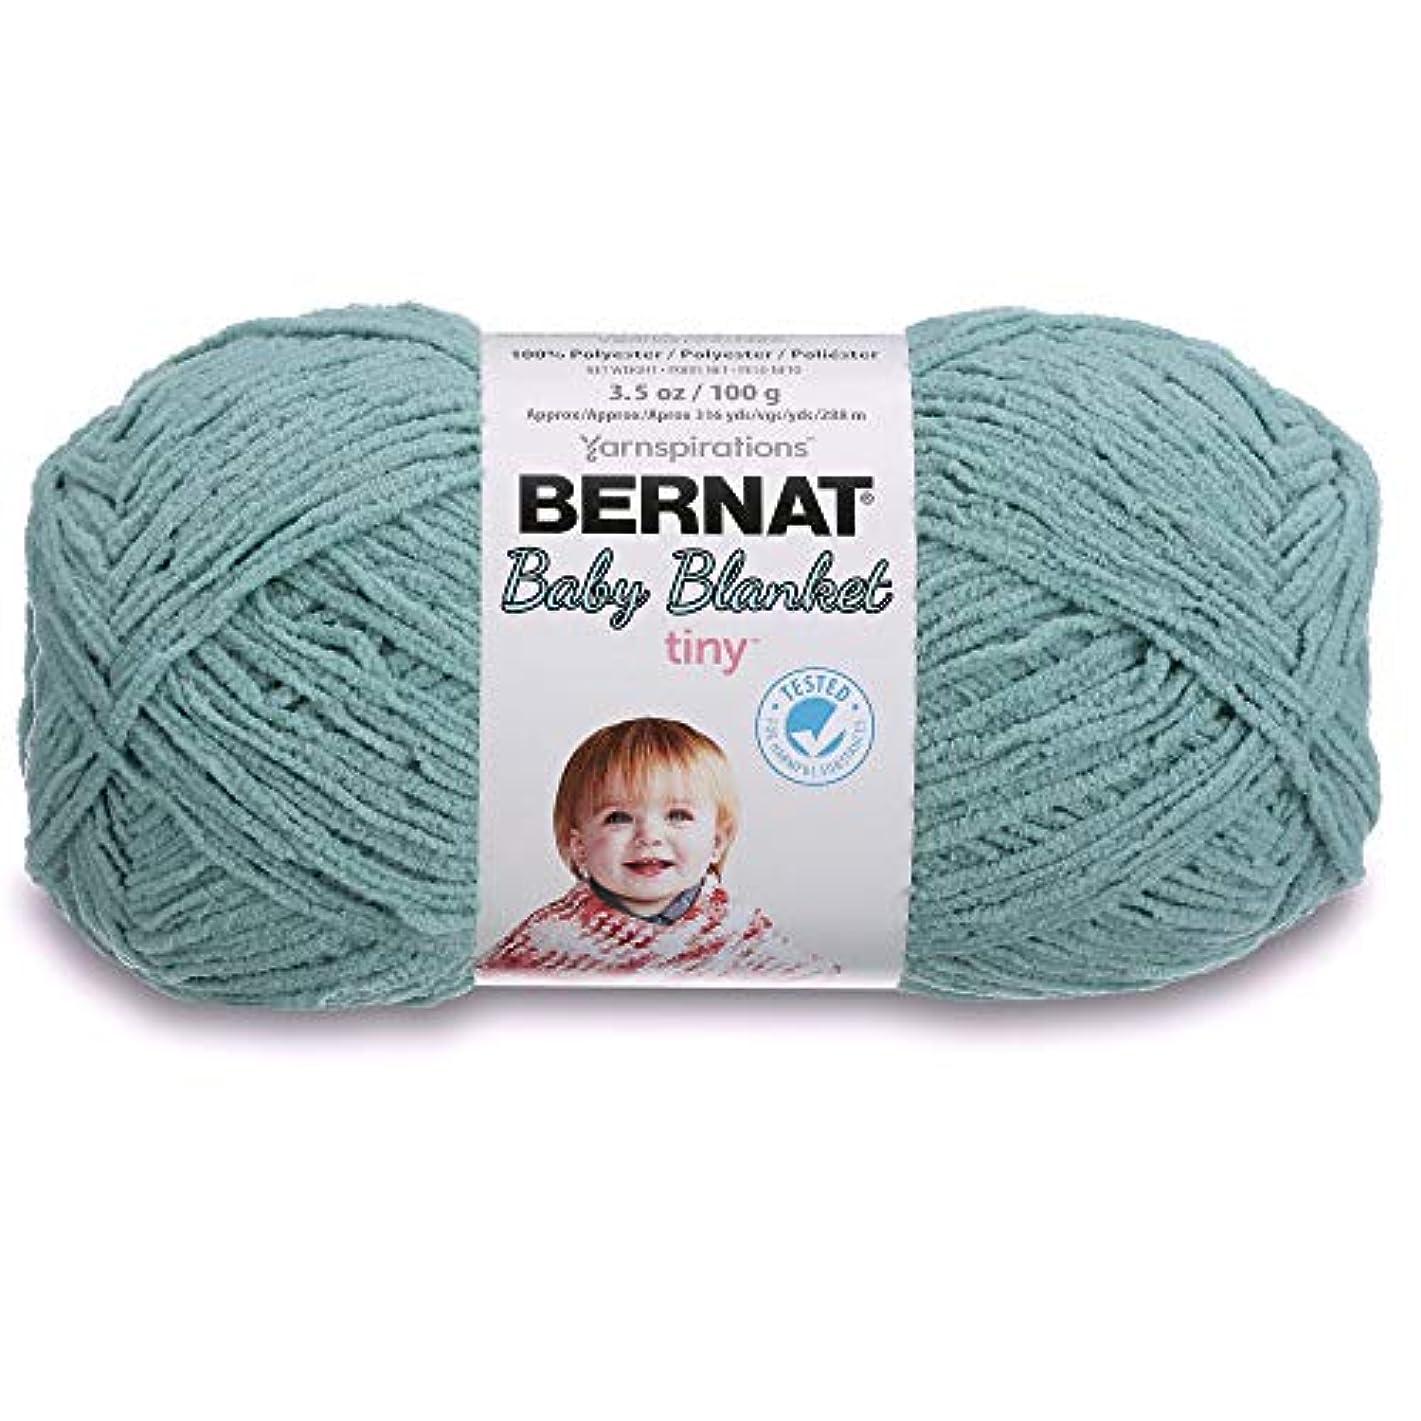 Bernat Baby Blanket Tiny Yarn, 3.5 oz, Gauge 4 Medium, Clear Sky